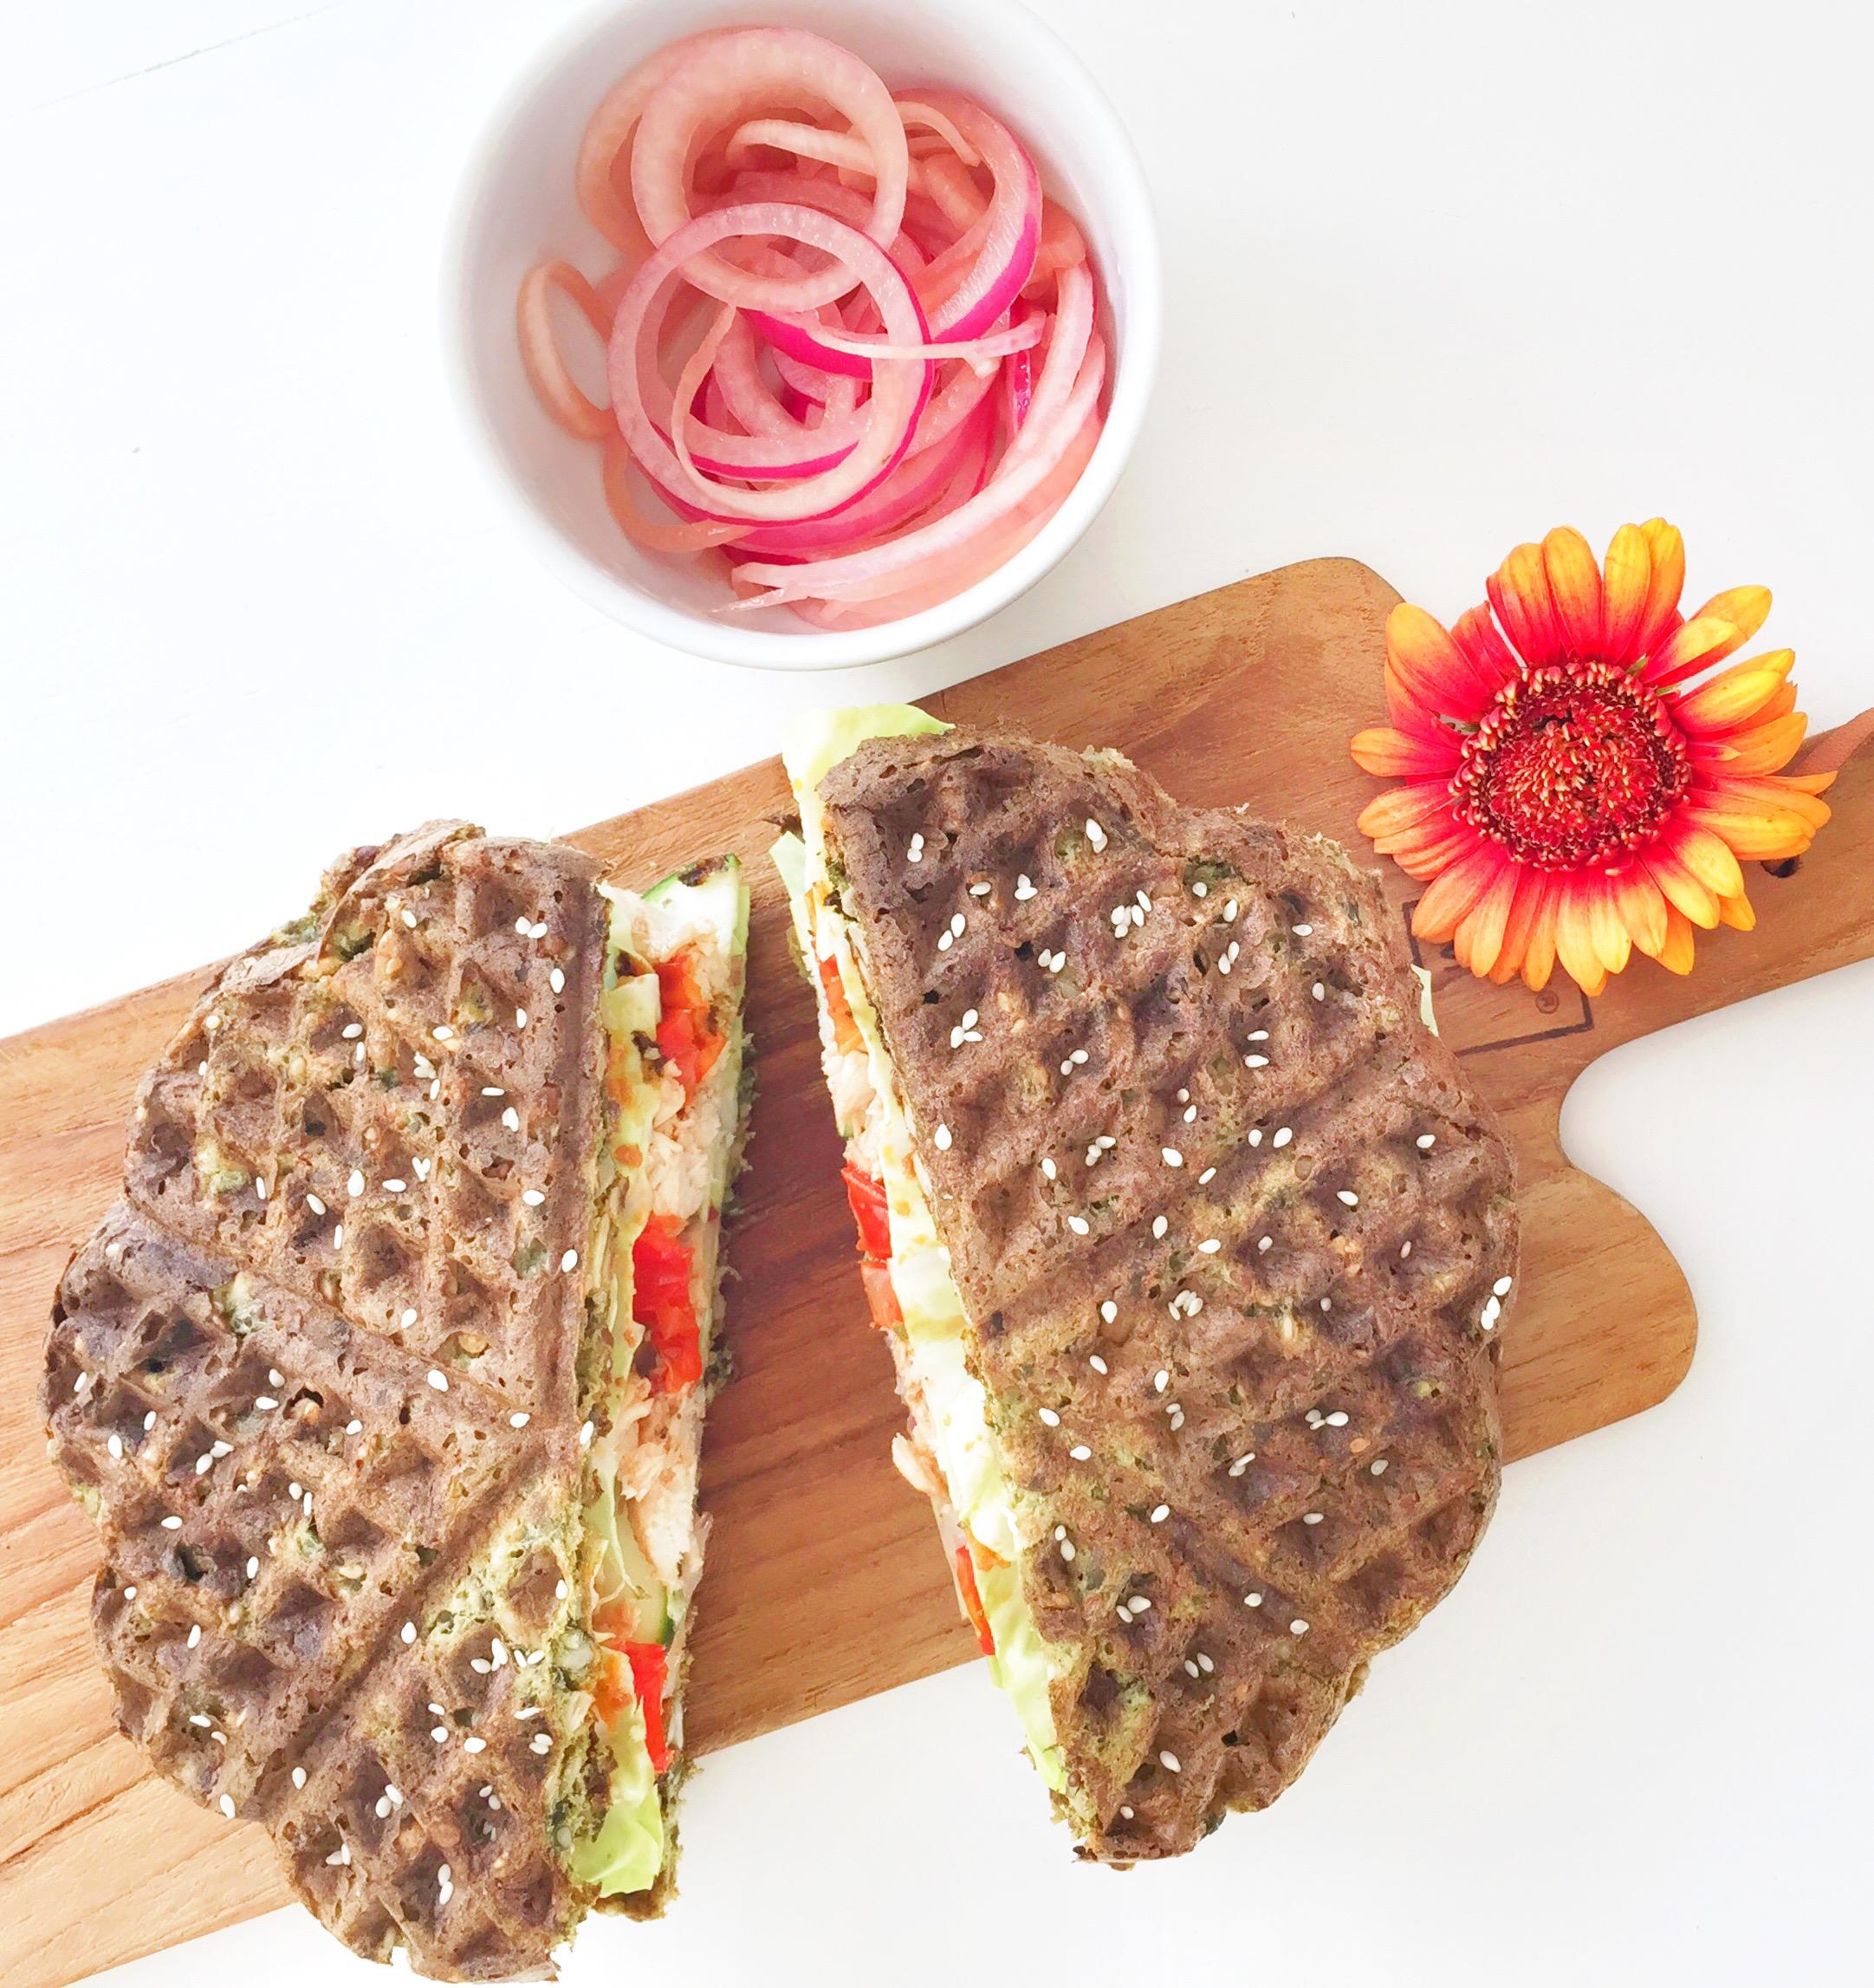 Sandwich til madpakken